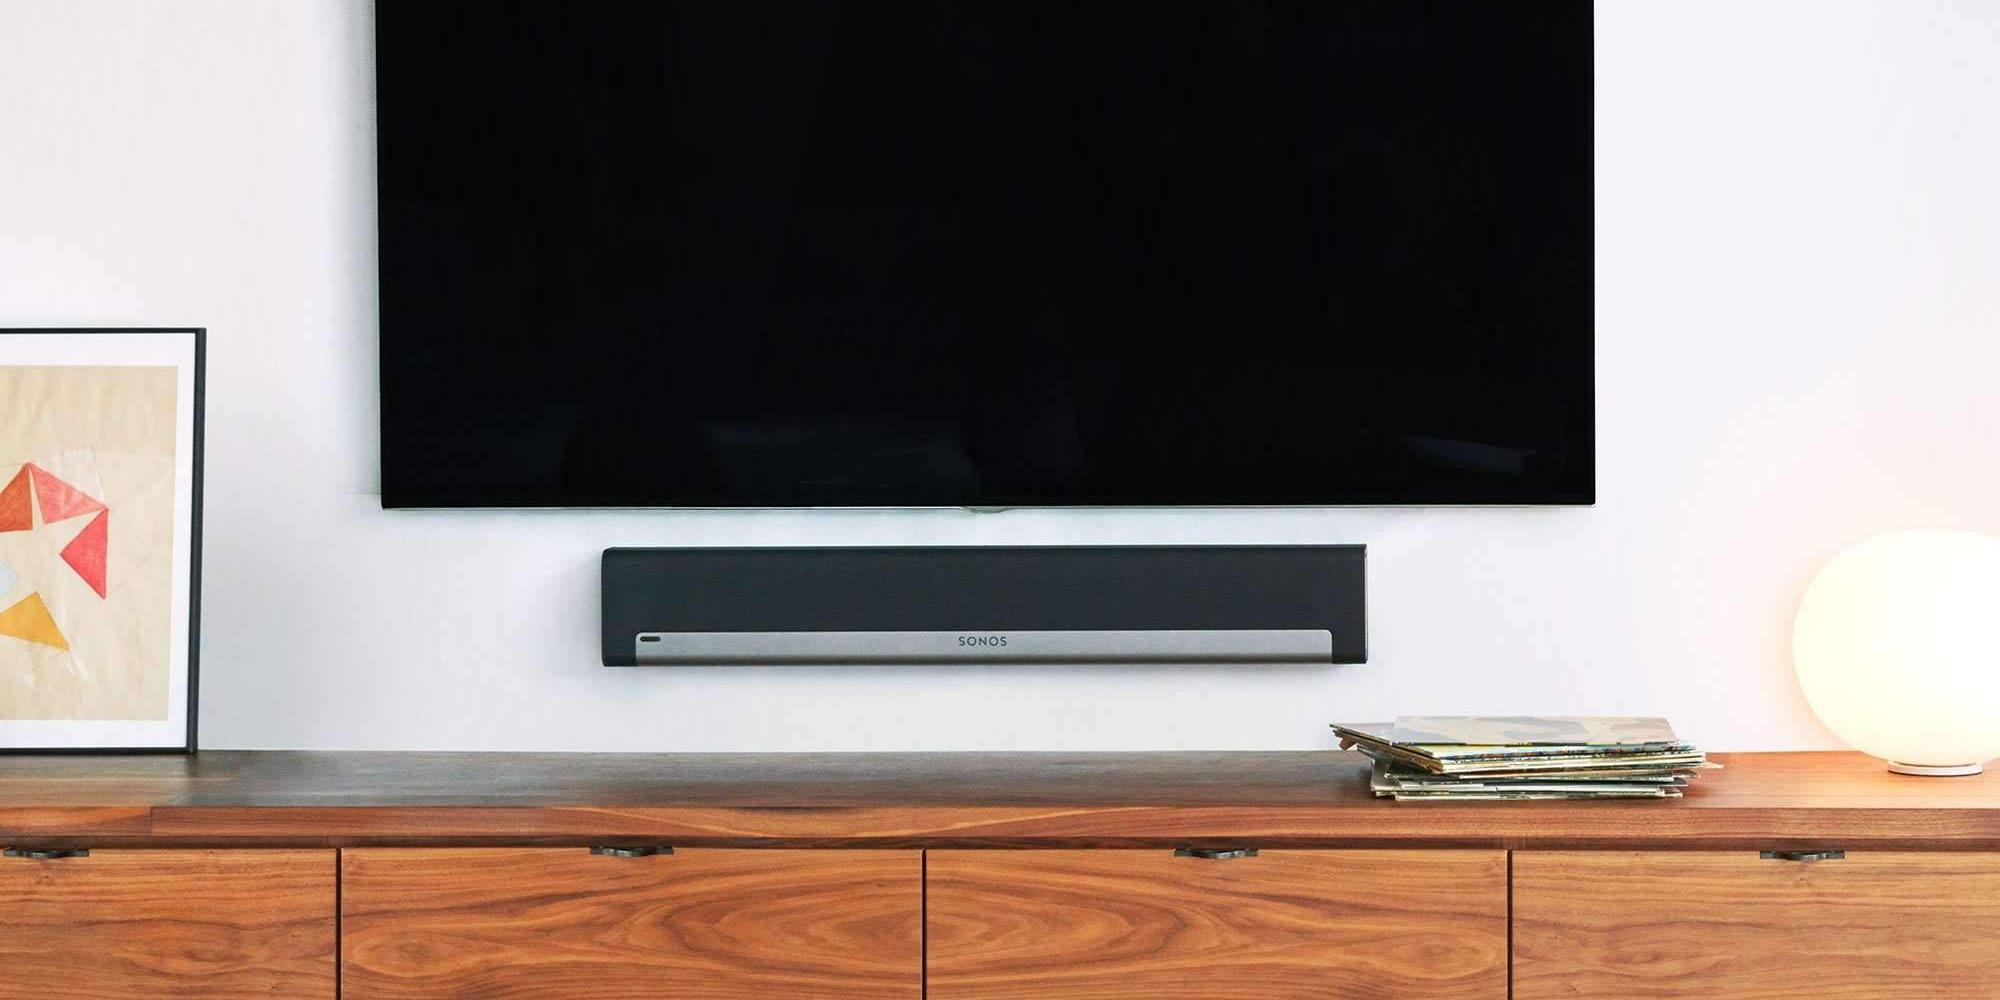 Playbar-soundbar with tv